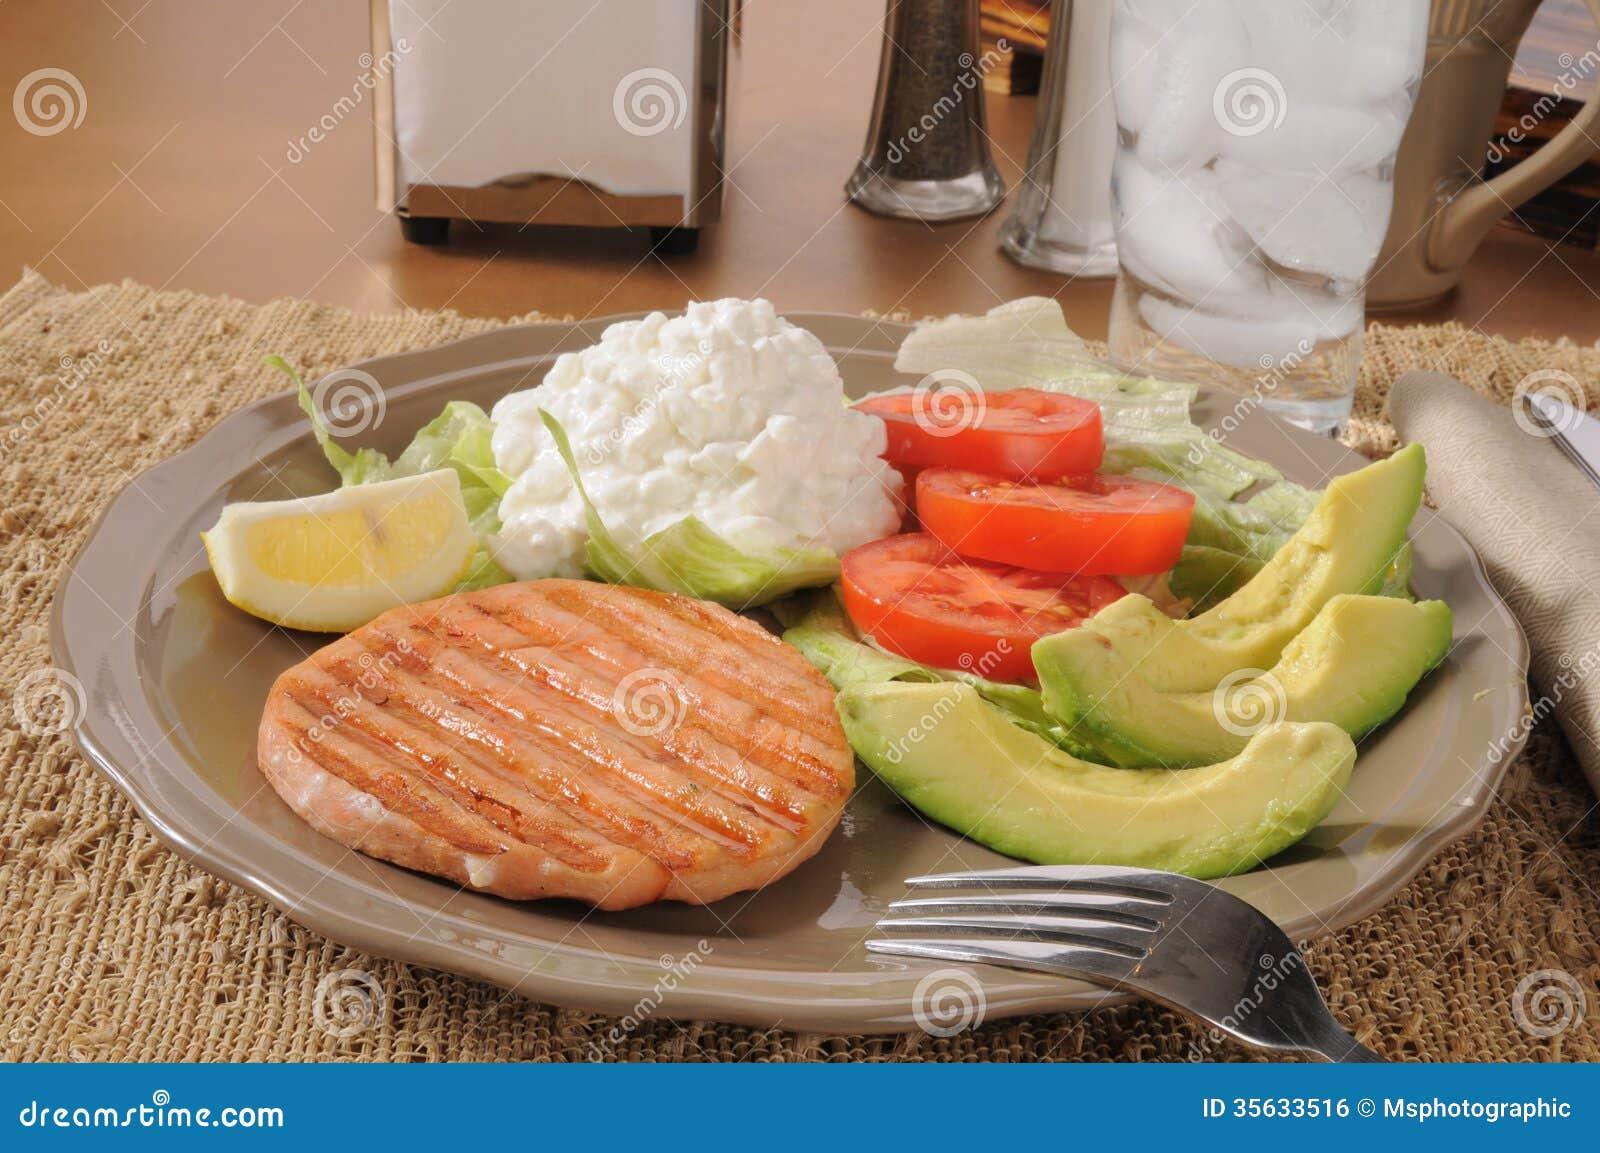 Amazing Diet Platter